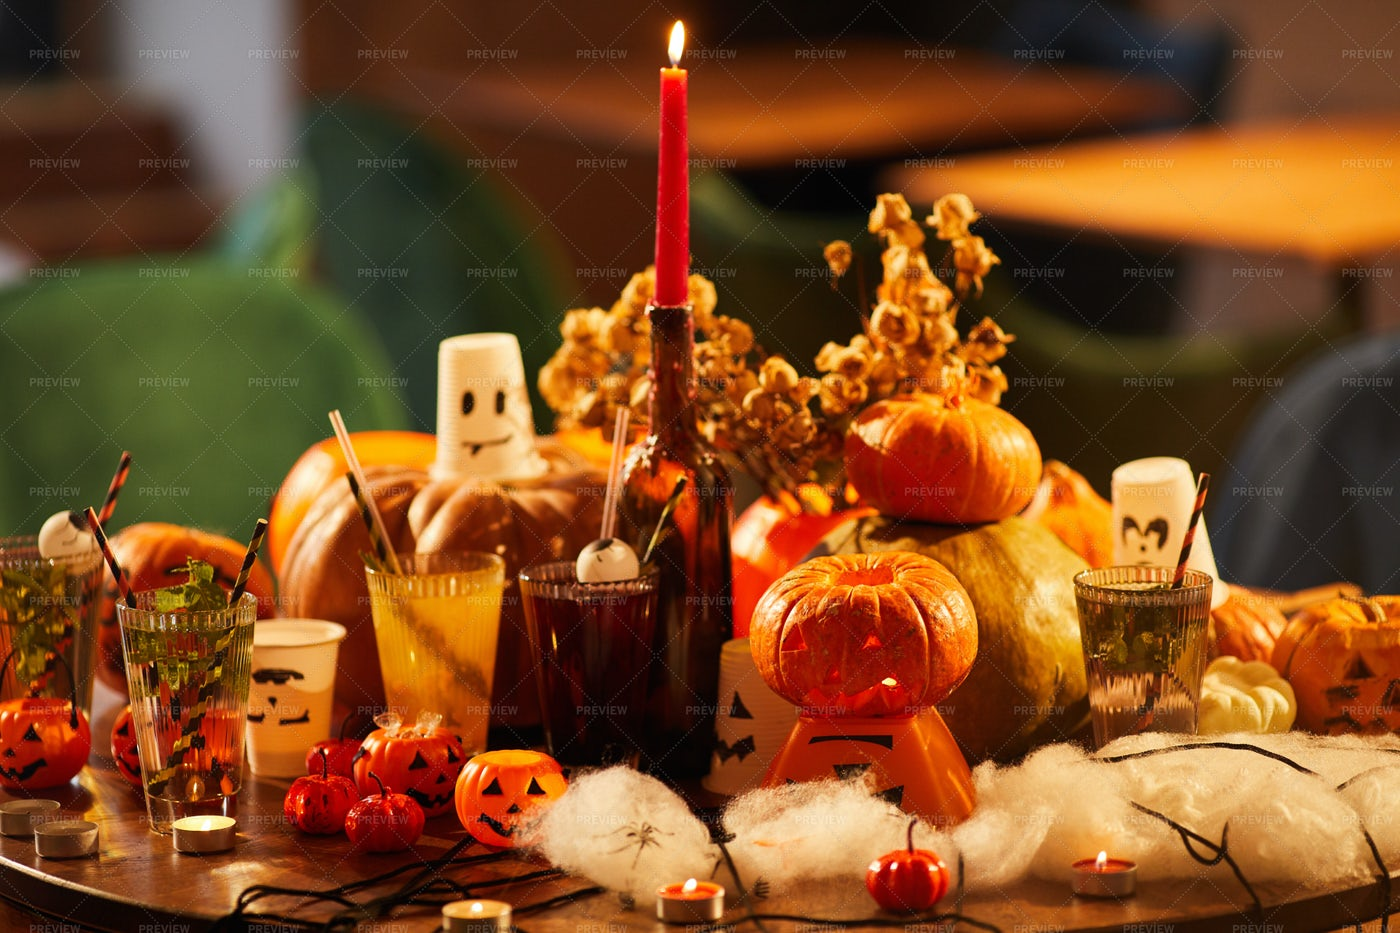 Festive Halloween Decorations: Stock Photos